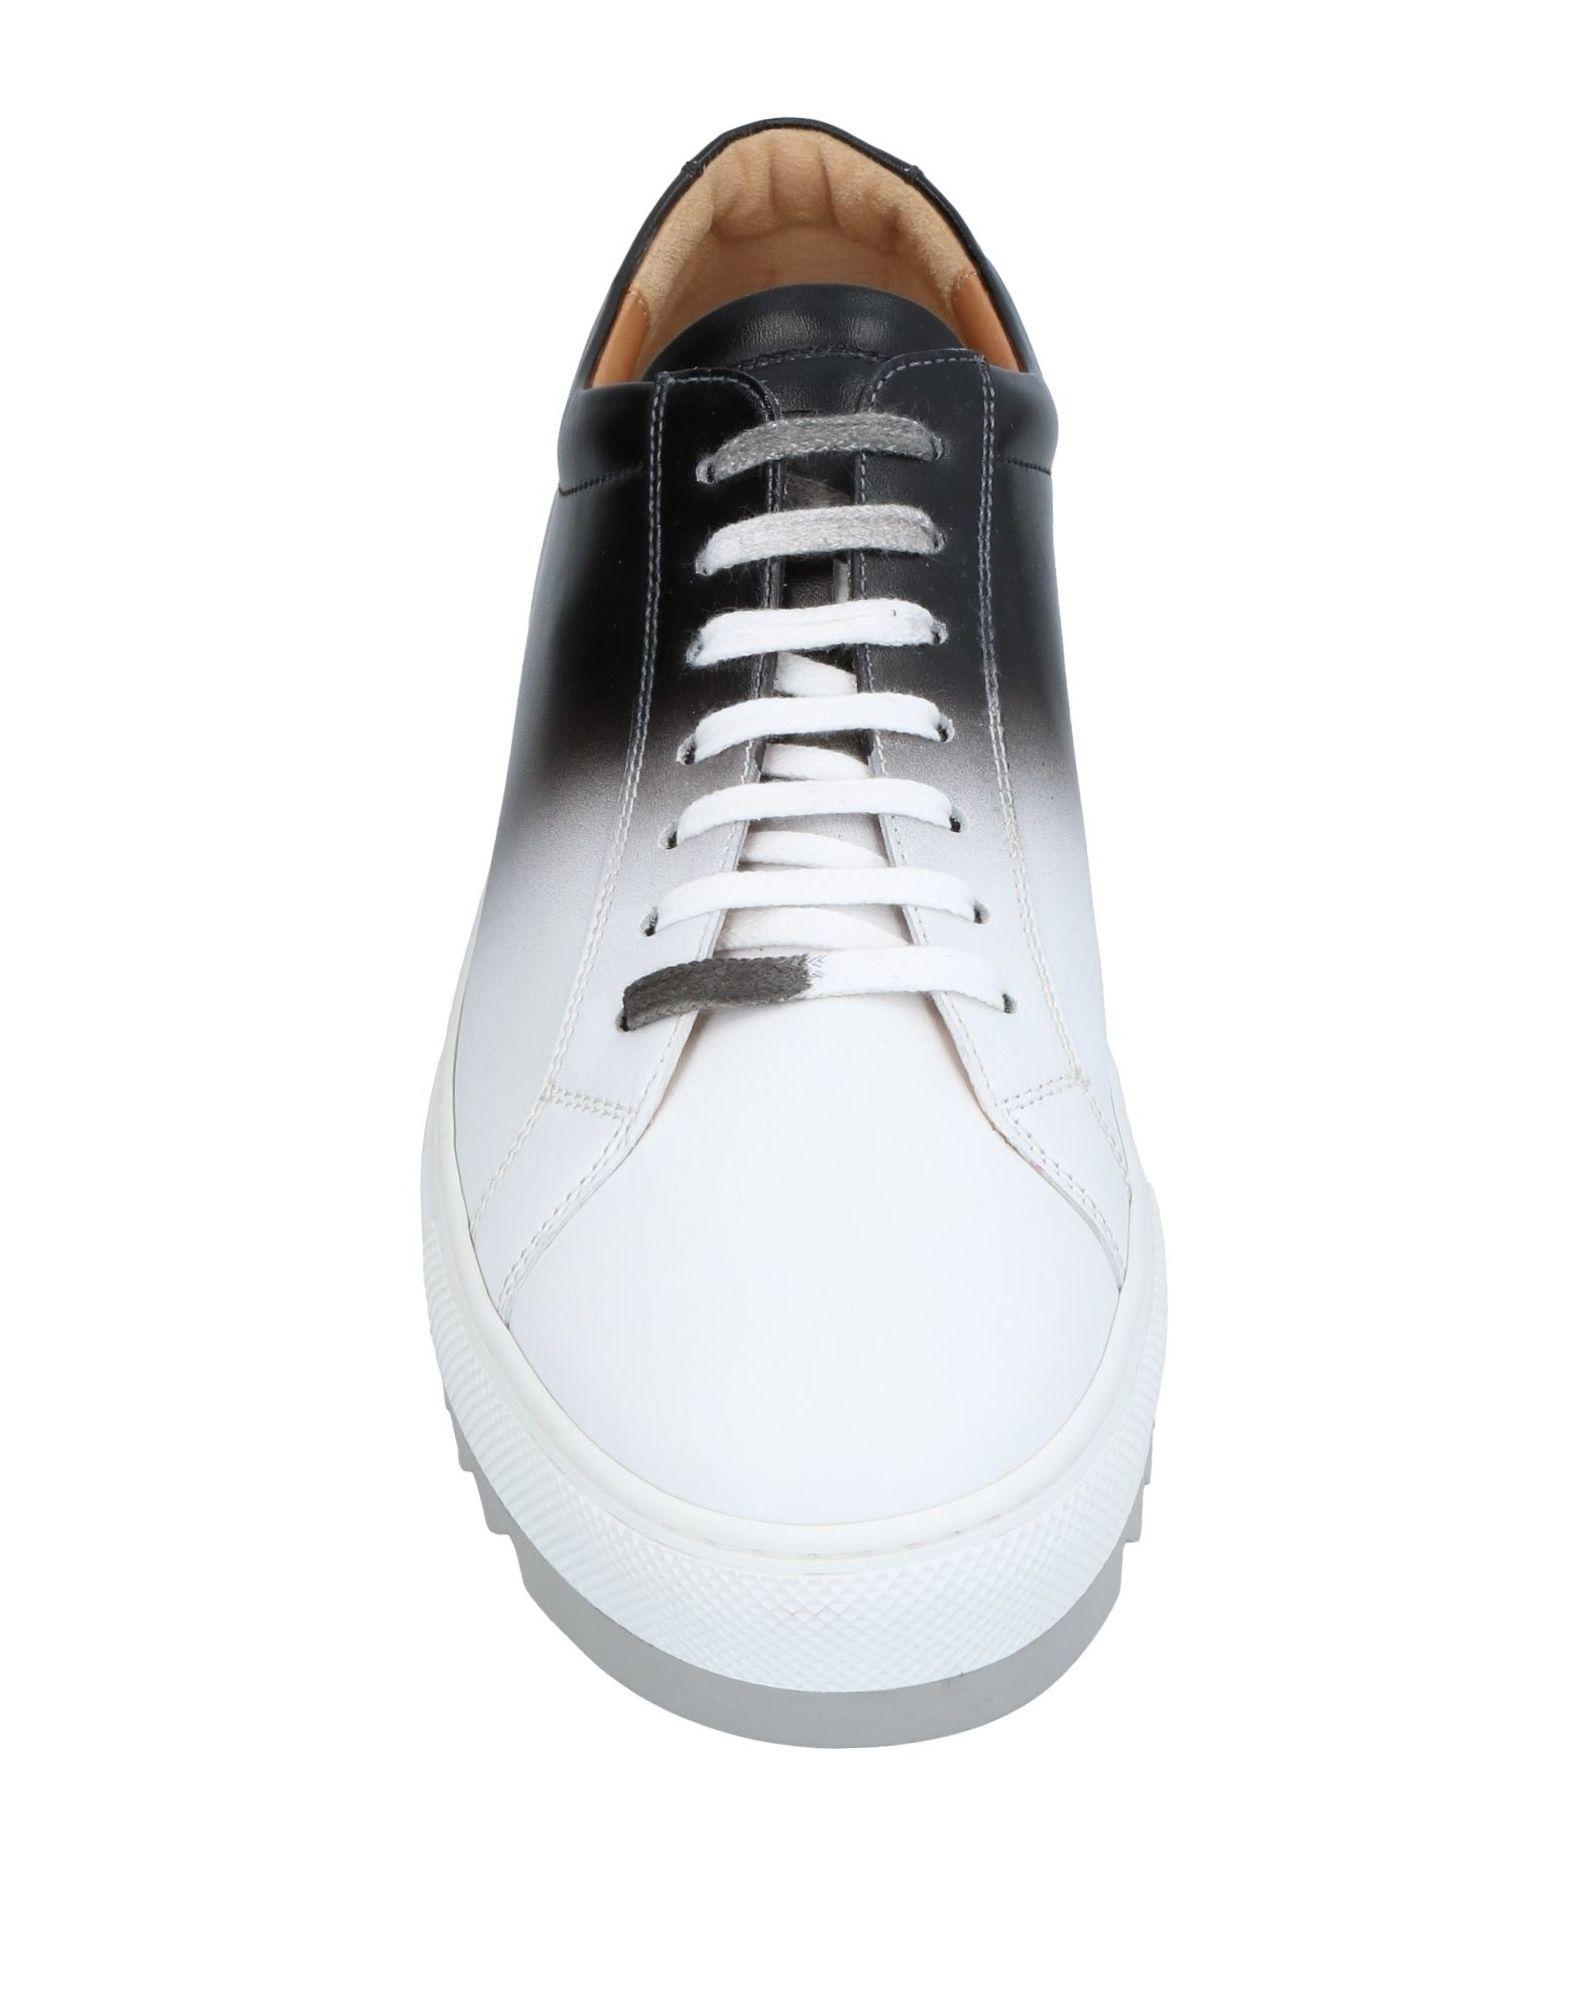 Salvatore Ferragamo Sneakers - Men Salvatore  Ferragamo Sneakers online on  Salvatore Canada - 11397802VO fc4fb4